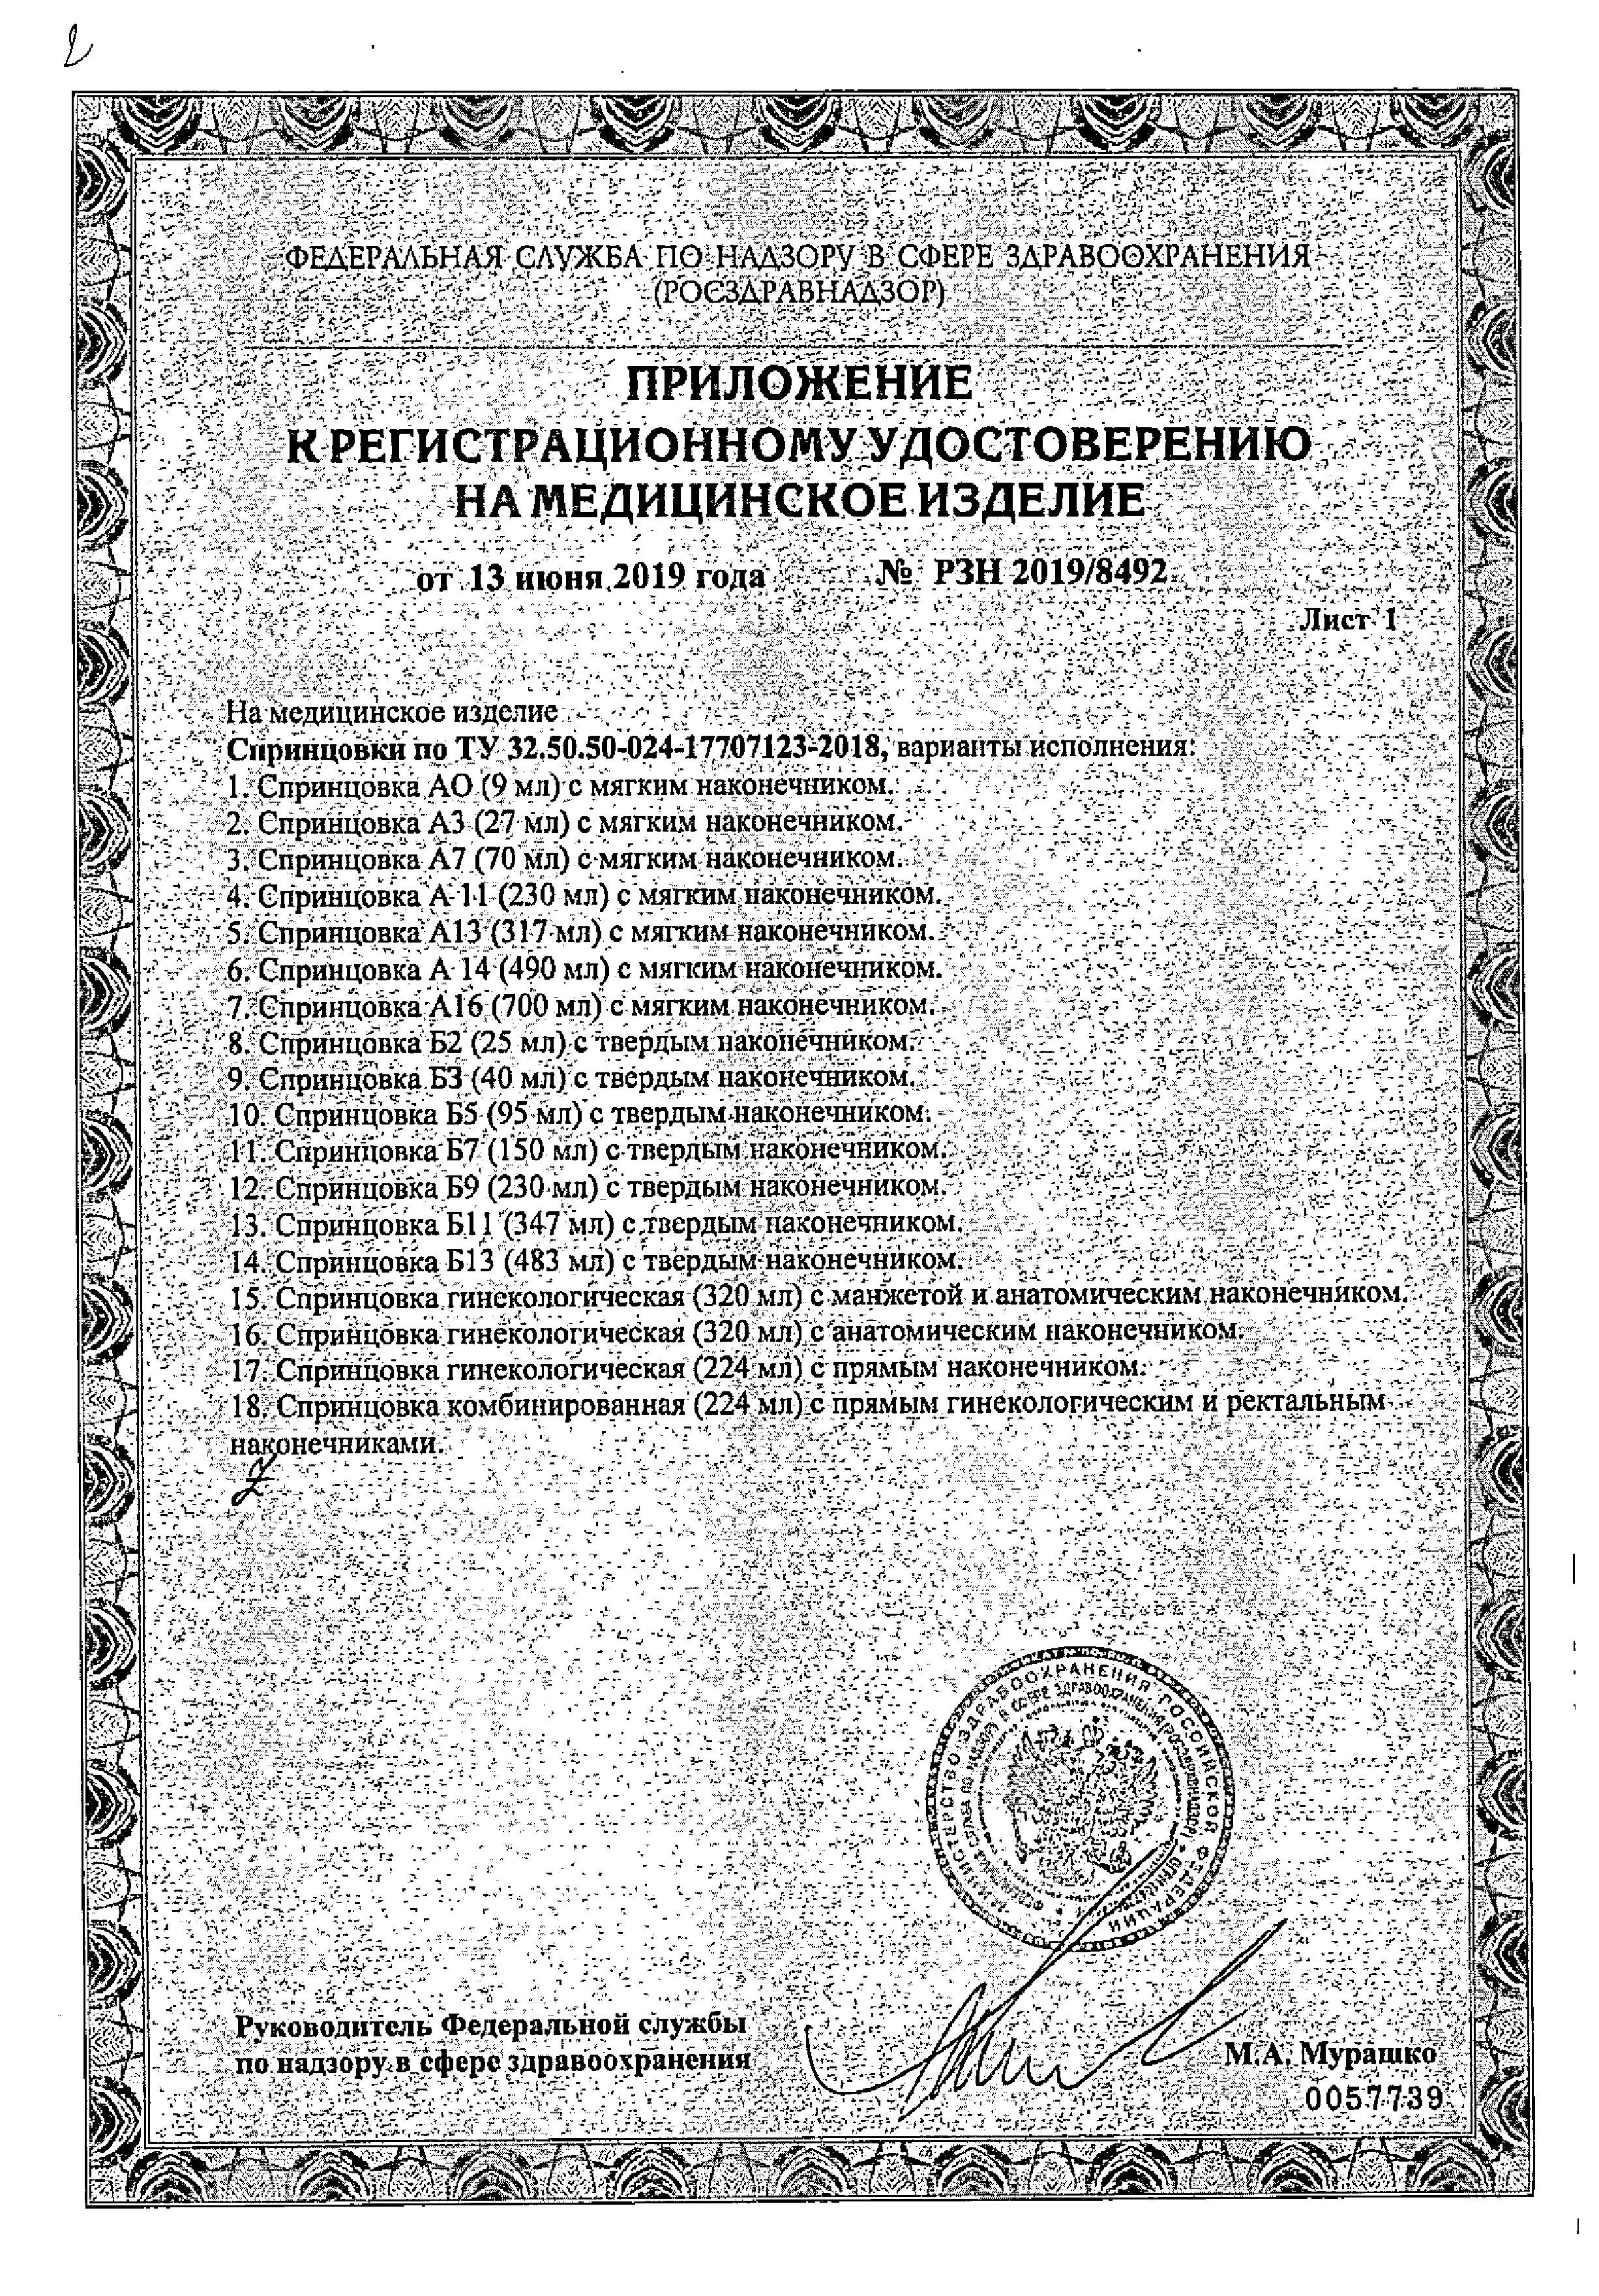 Спринцовка Альпина Пласт А7 сертификат